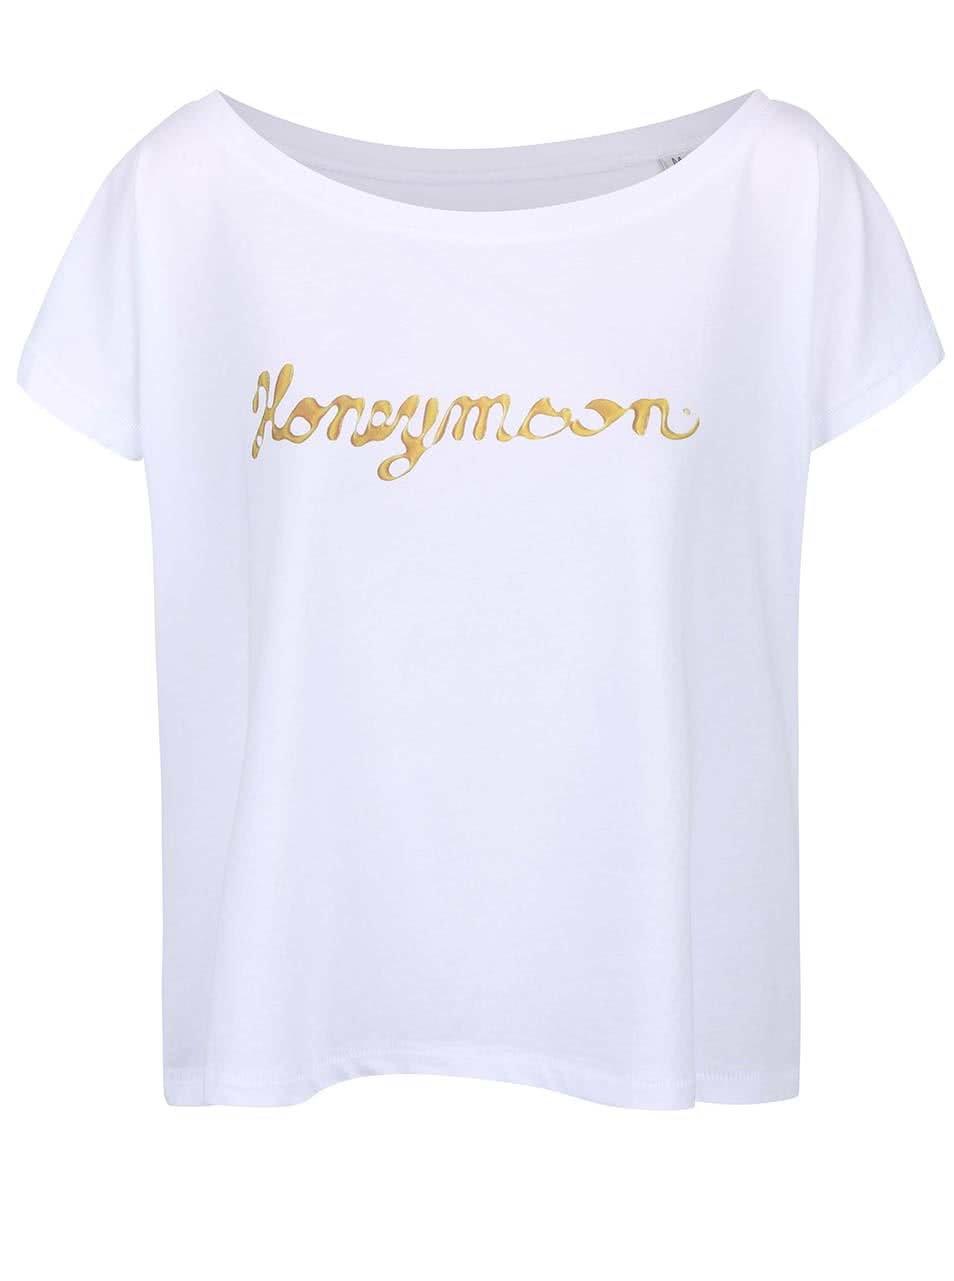 9ee38364e9e6 Bílé dámské volnější tričko ZOOT Originál Honeymoon